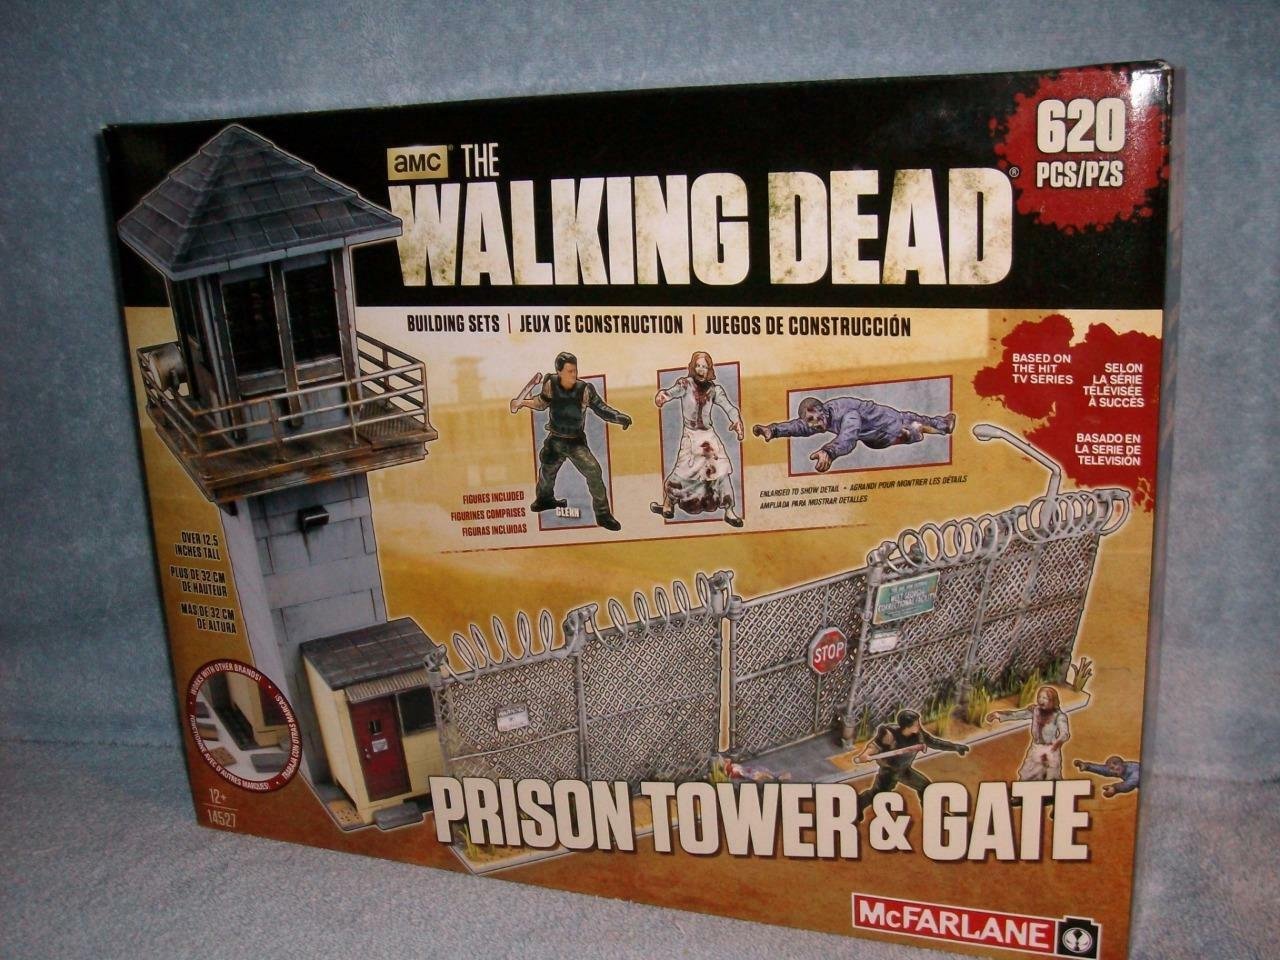 The Walking Dead Prison Tower & Gate AMC Building Sets McFarlane Walkers Glenn